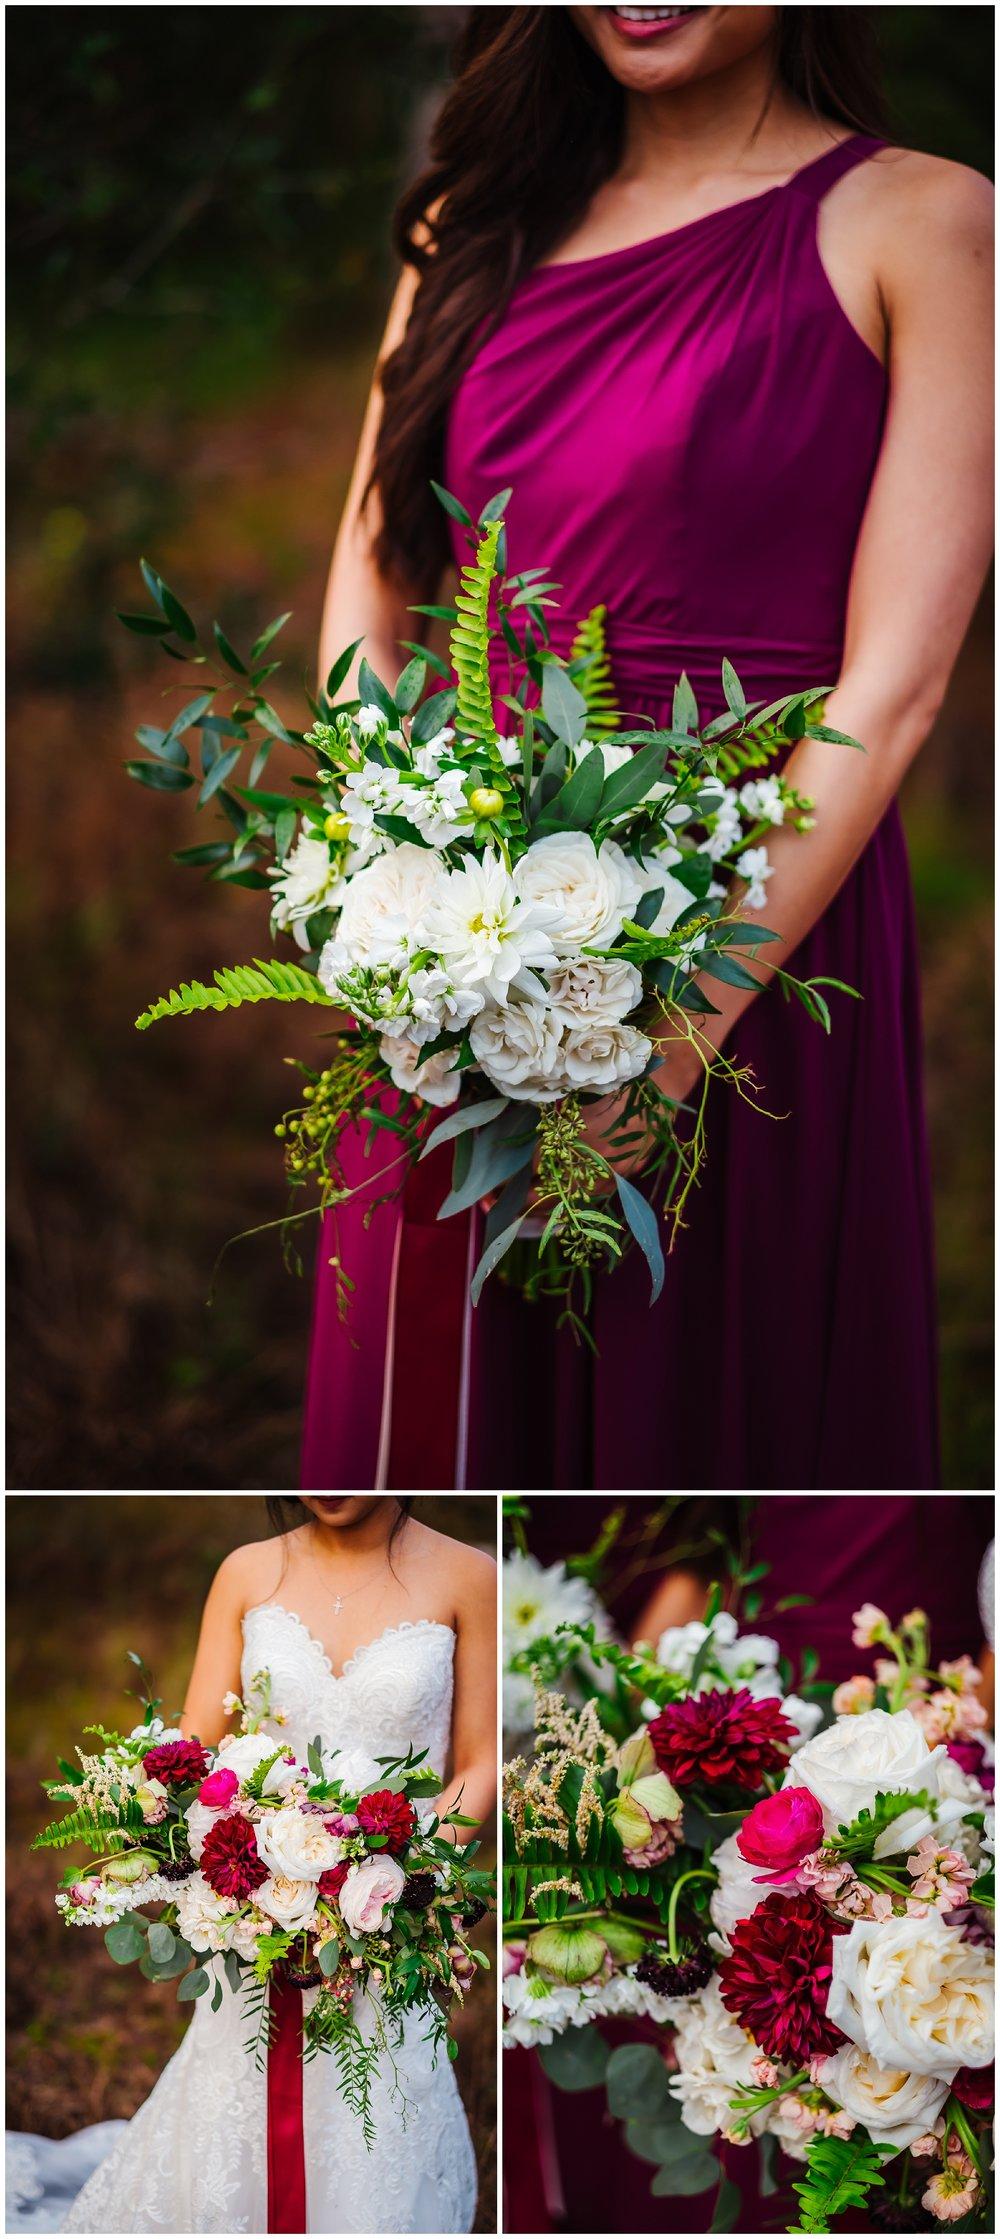 tampa-wedding-photographer-philipino-colorful-woods-ballroom-church-mass-confetti-fuscia_0049.jpg